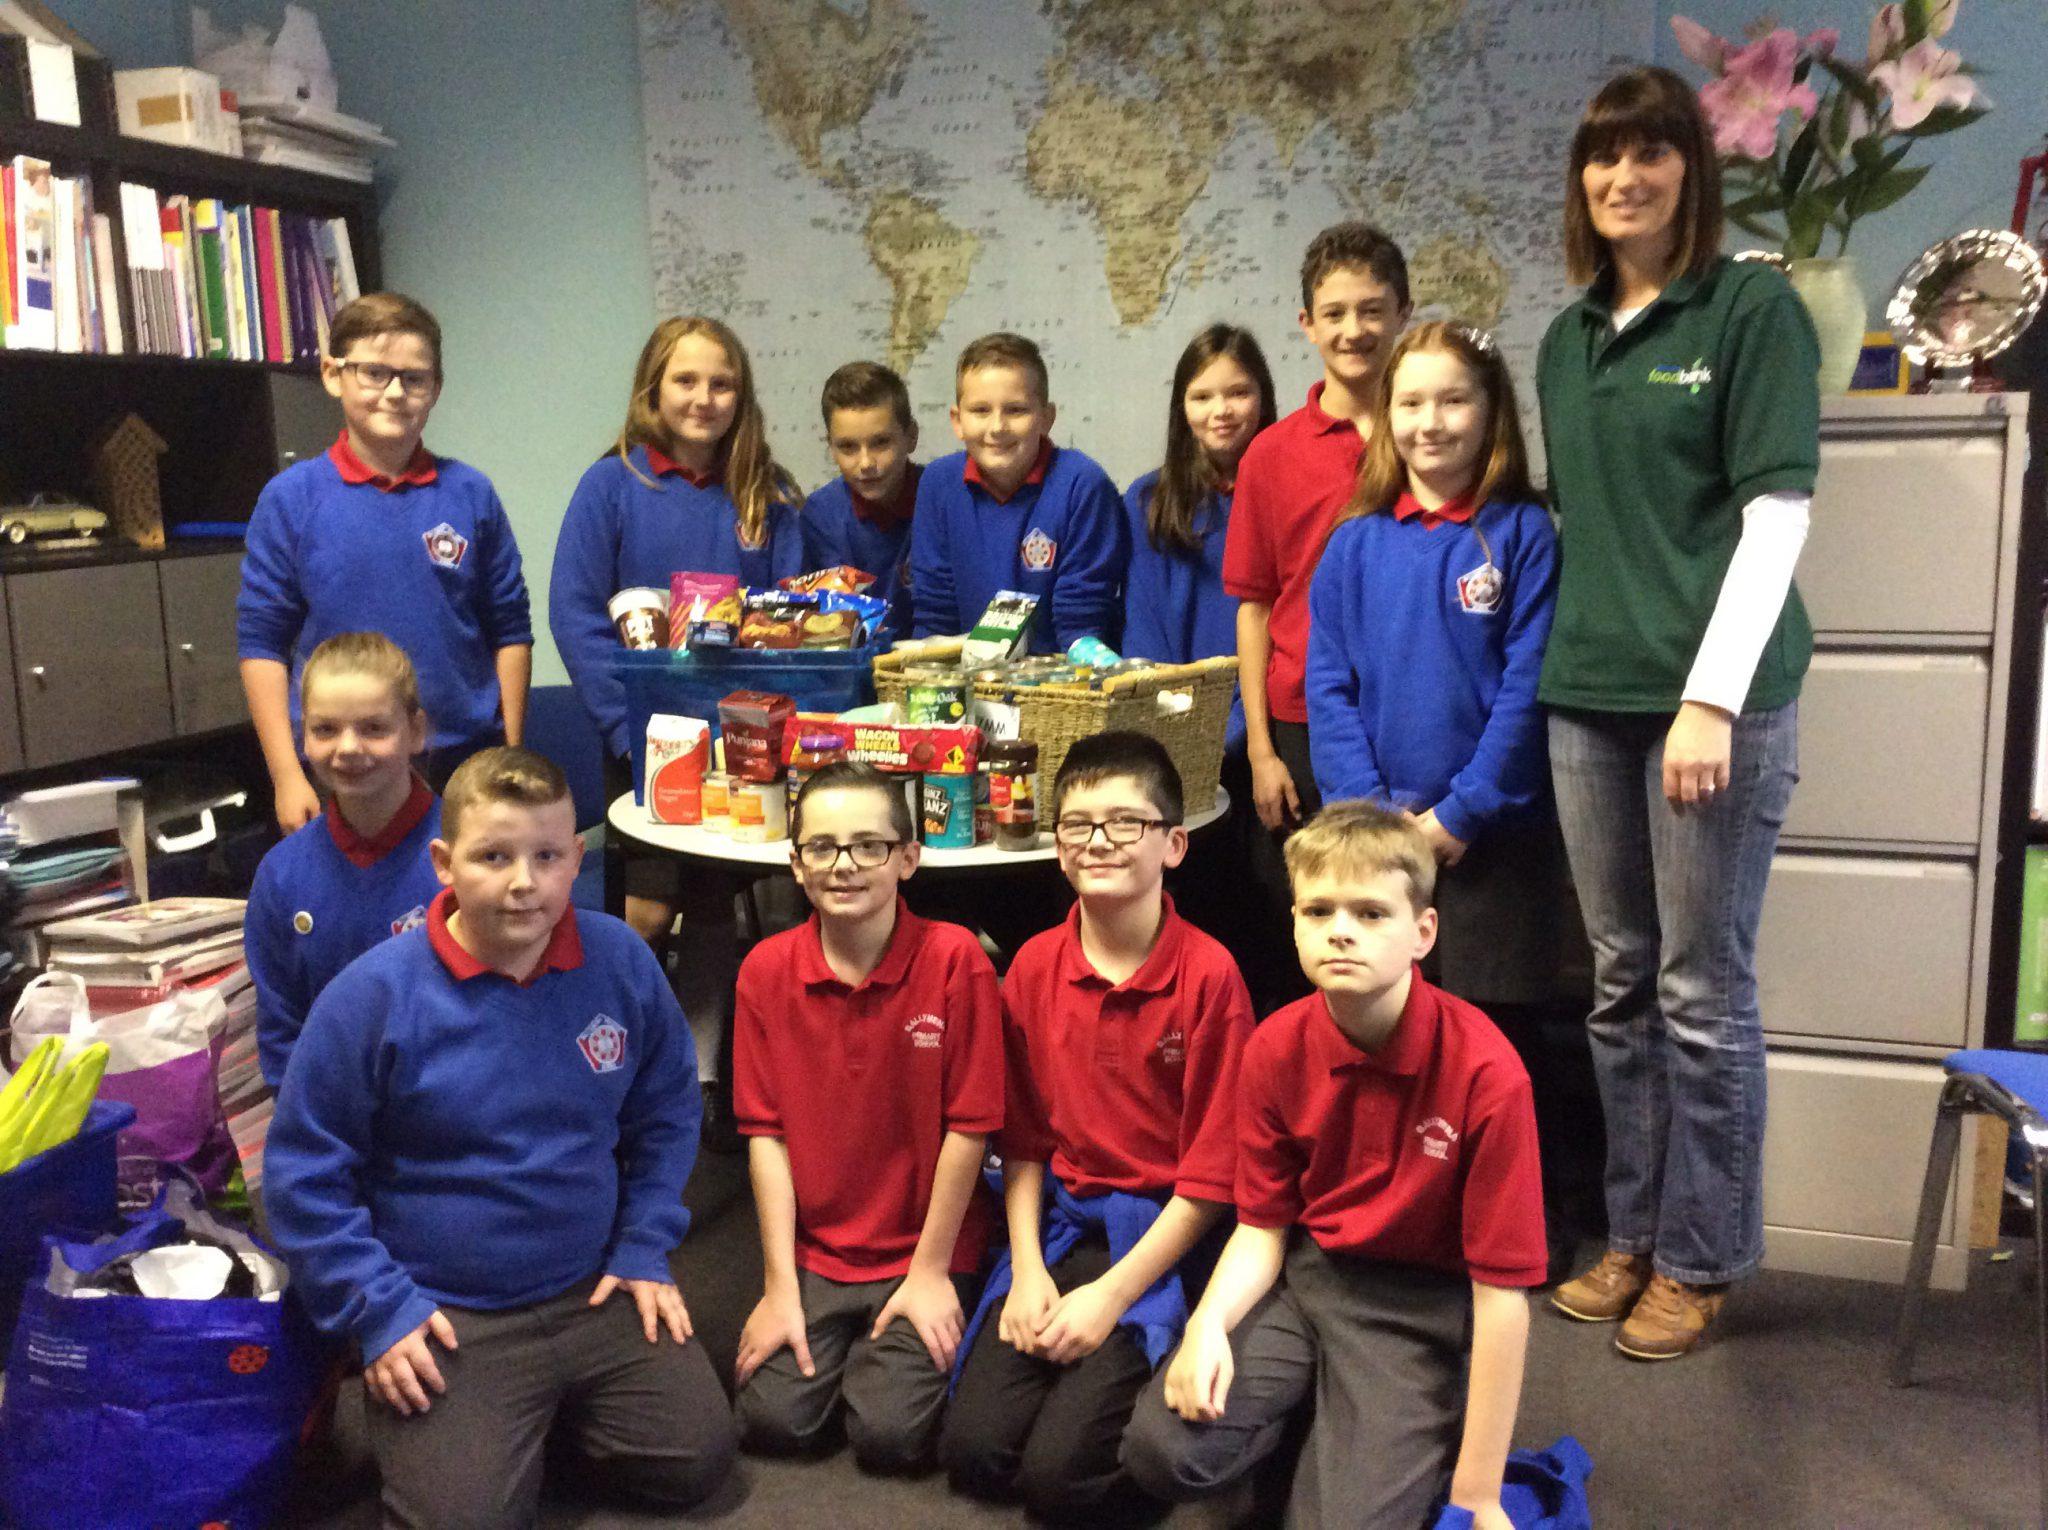 Ballymena Primary School Support Foodbank